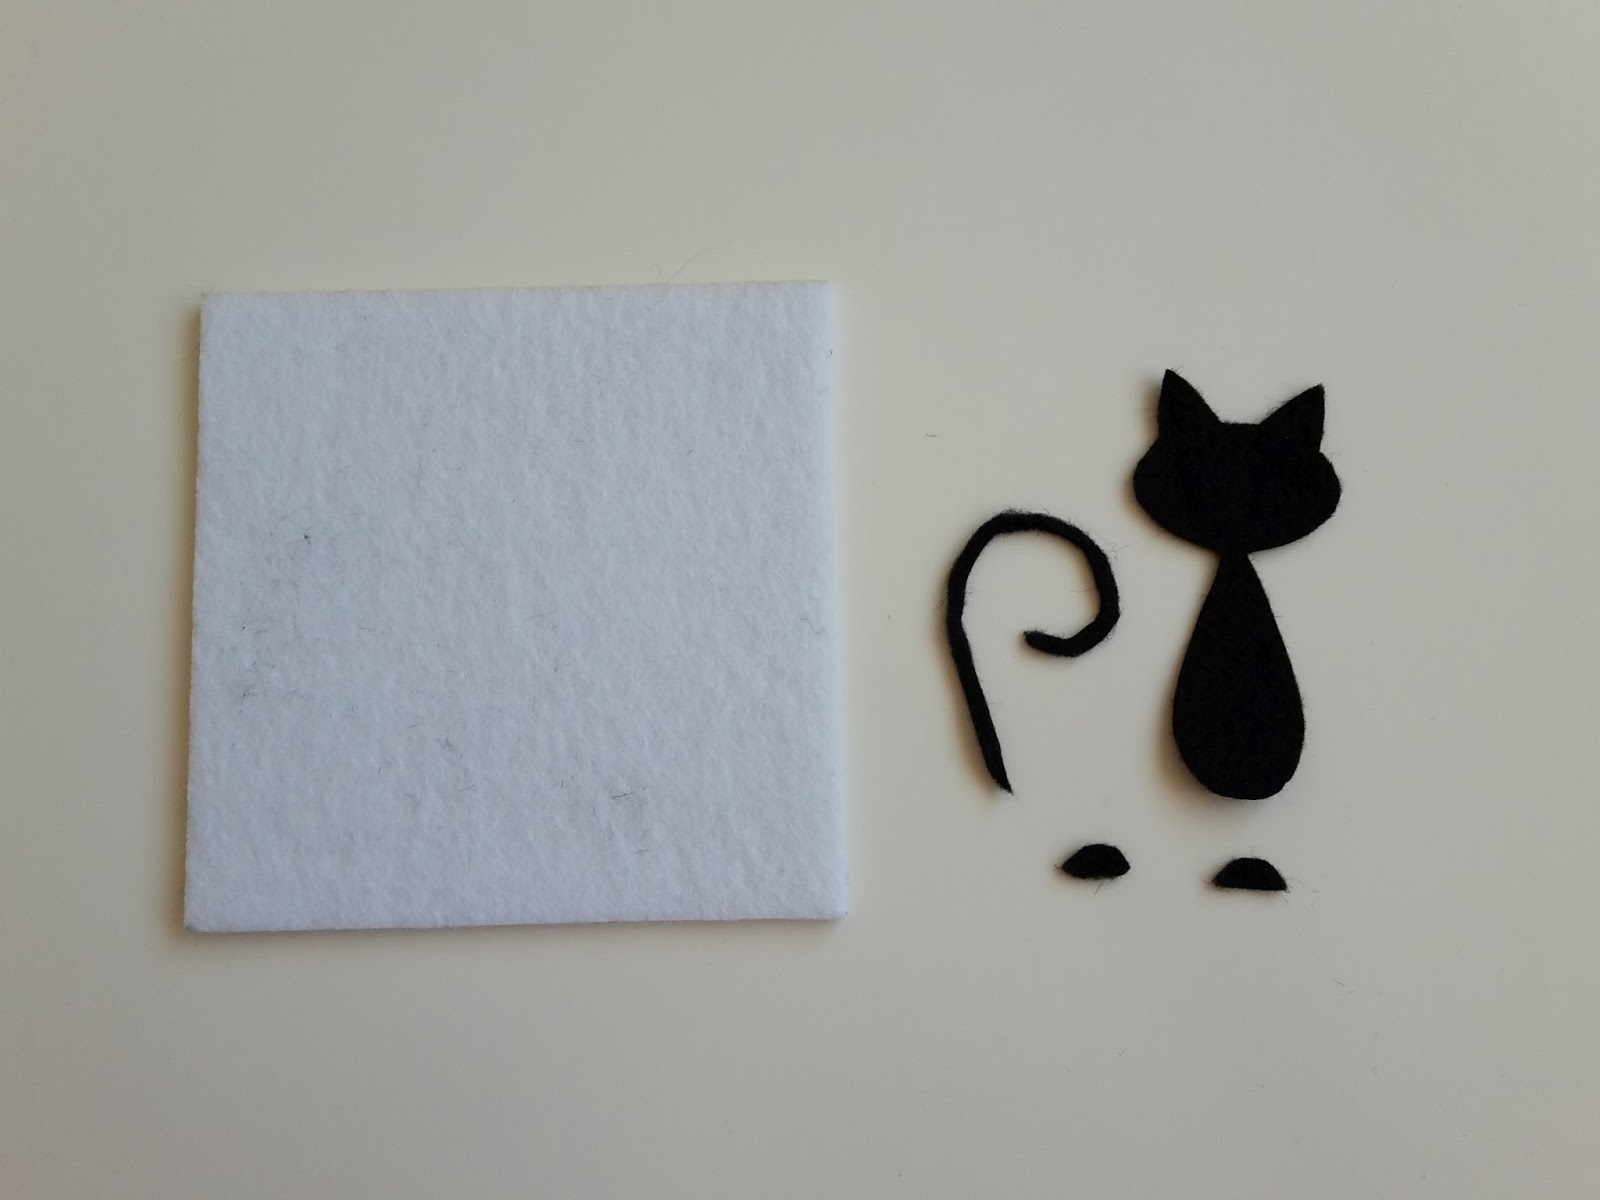 Inne rodzaje JustMadeArt: Biała podstawka pod kubek z kotem SV84